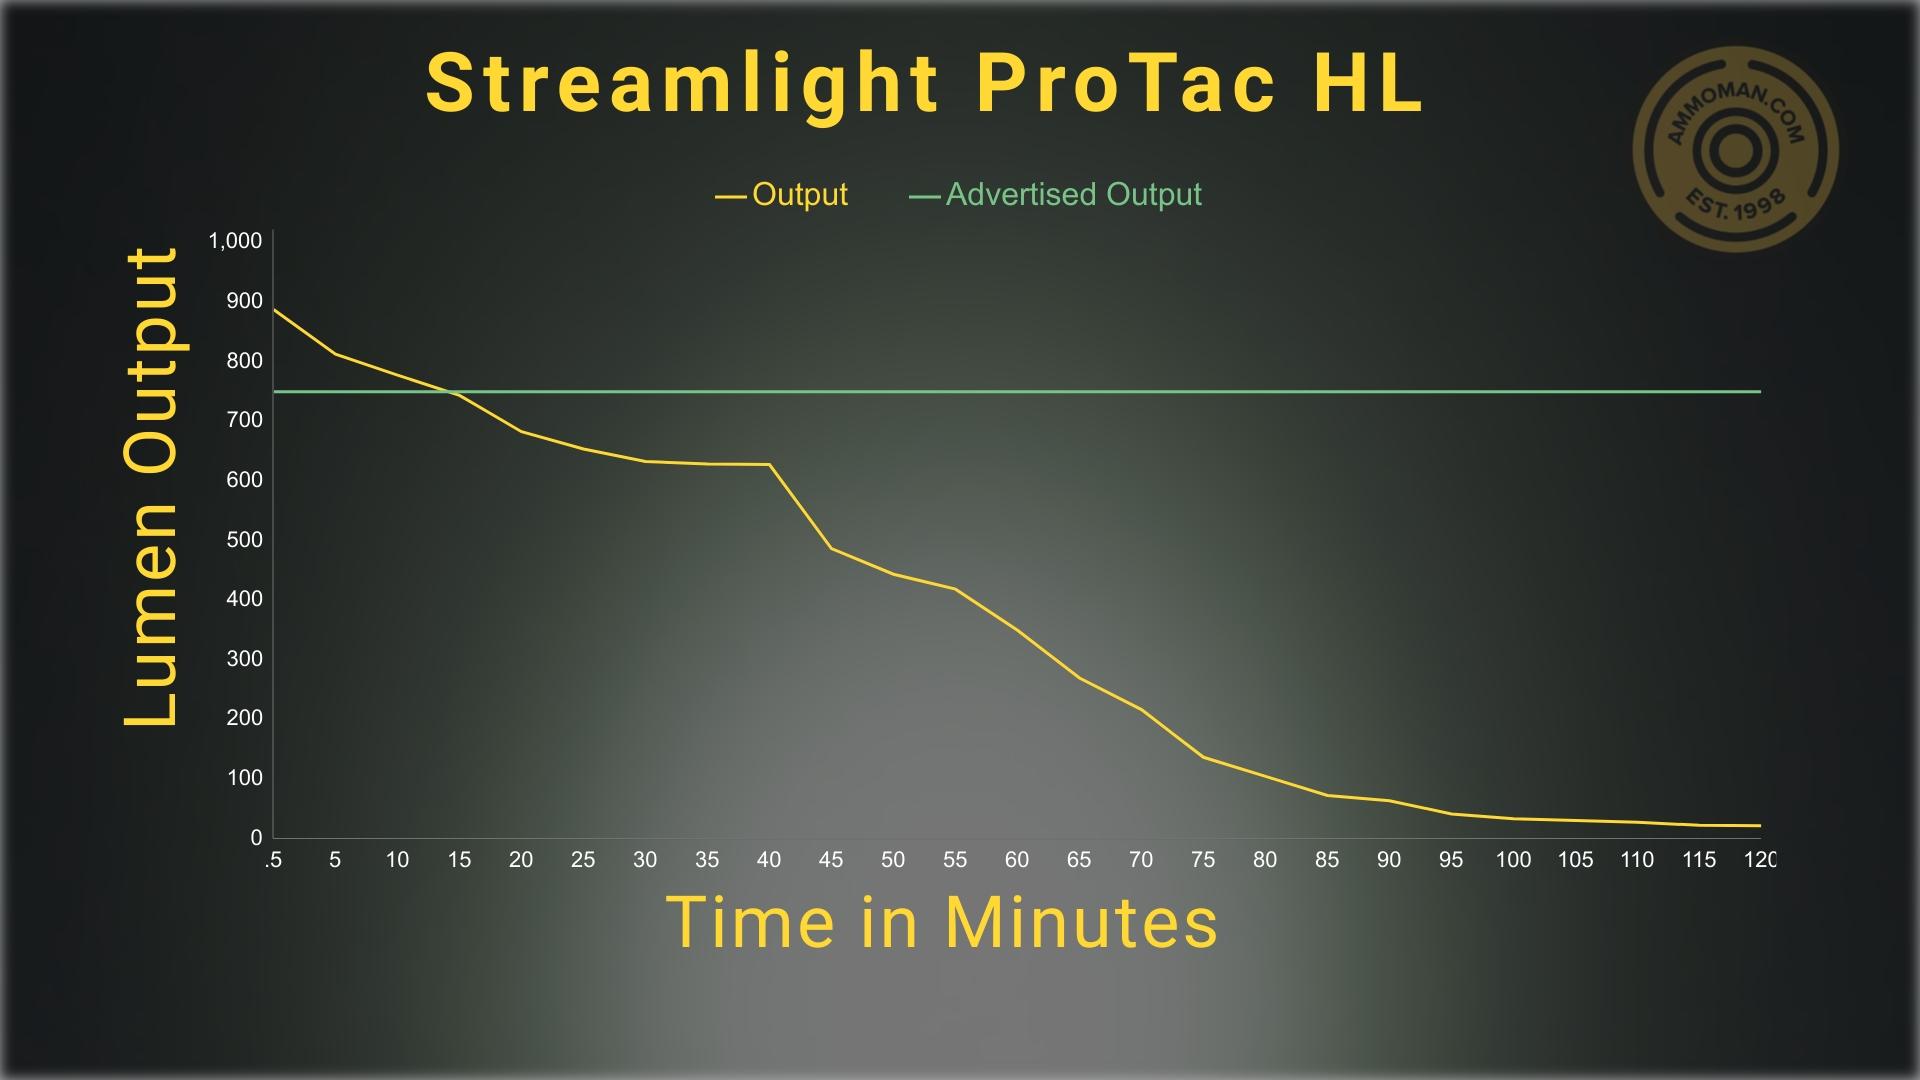 Lumen output tests for the Streamlight ProTAC HL flashlight